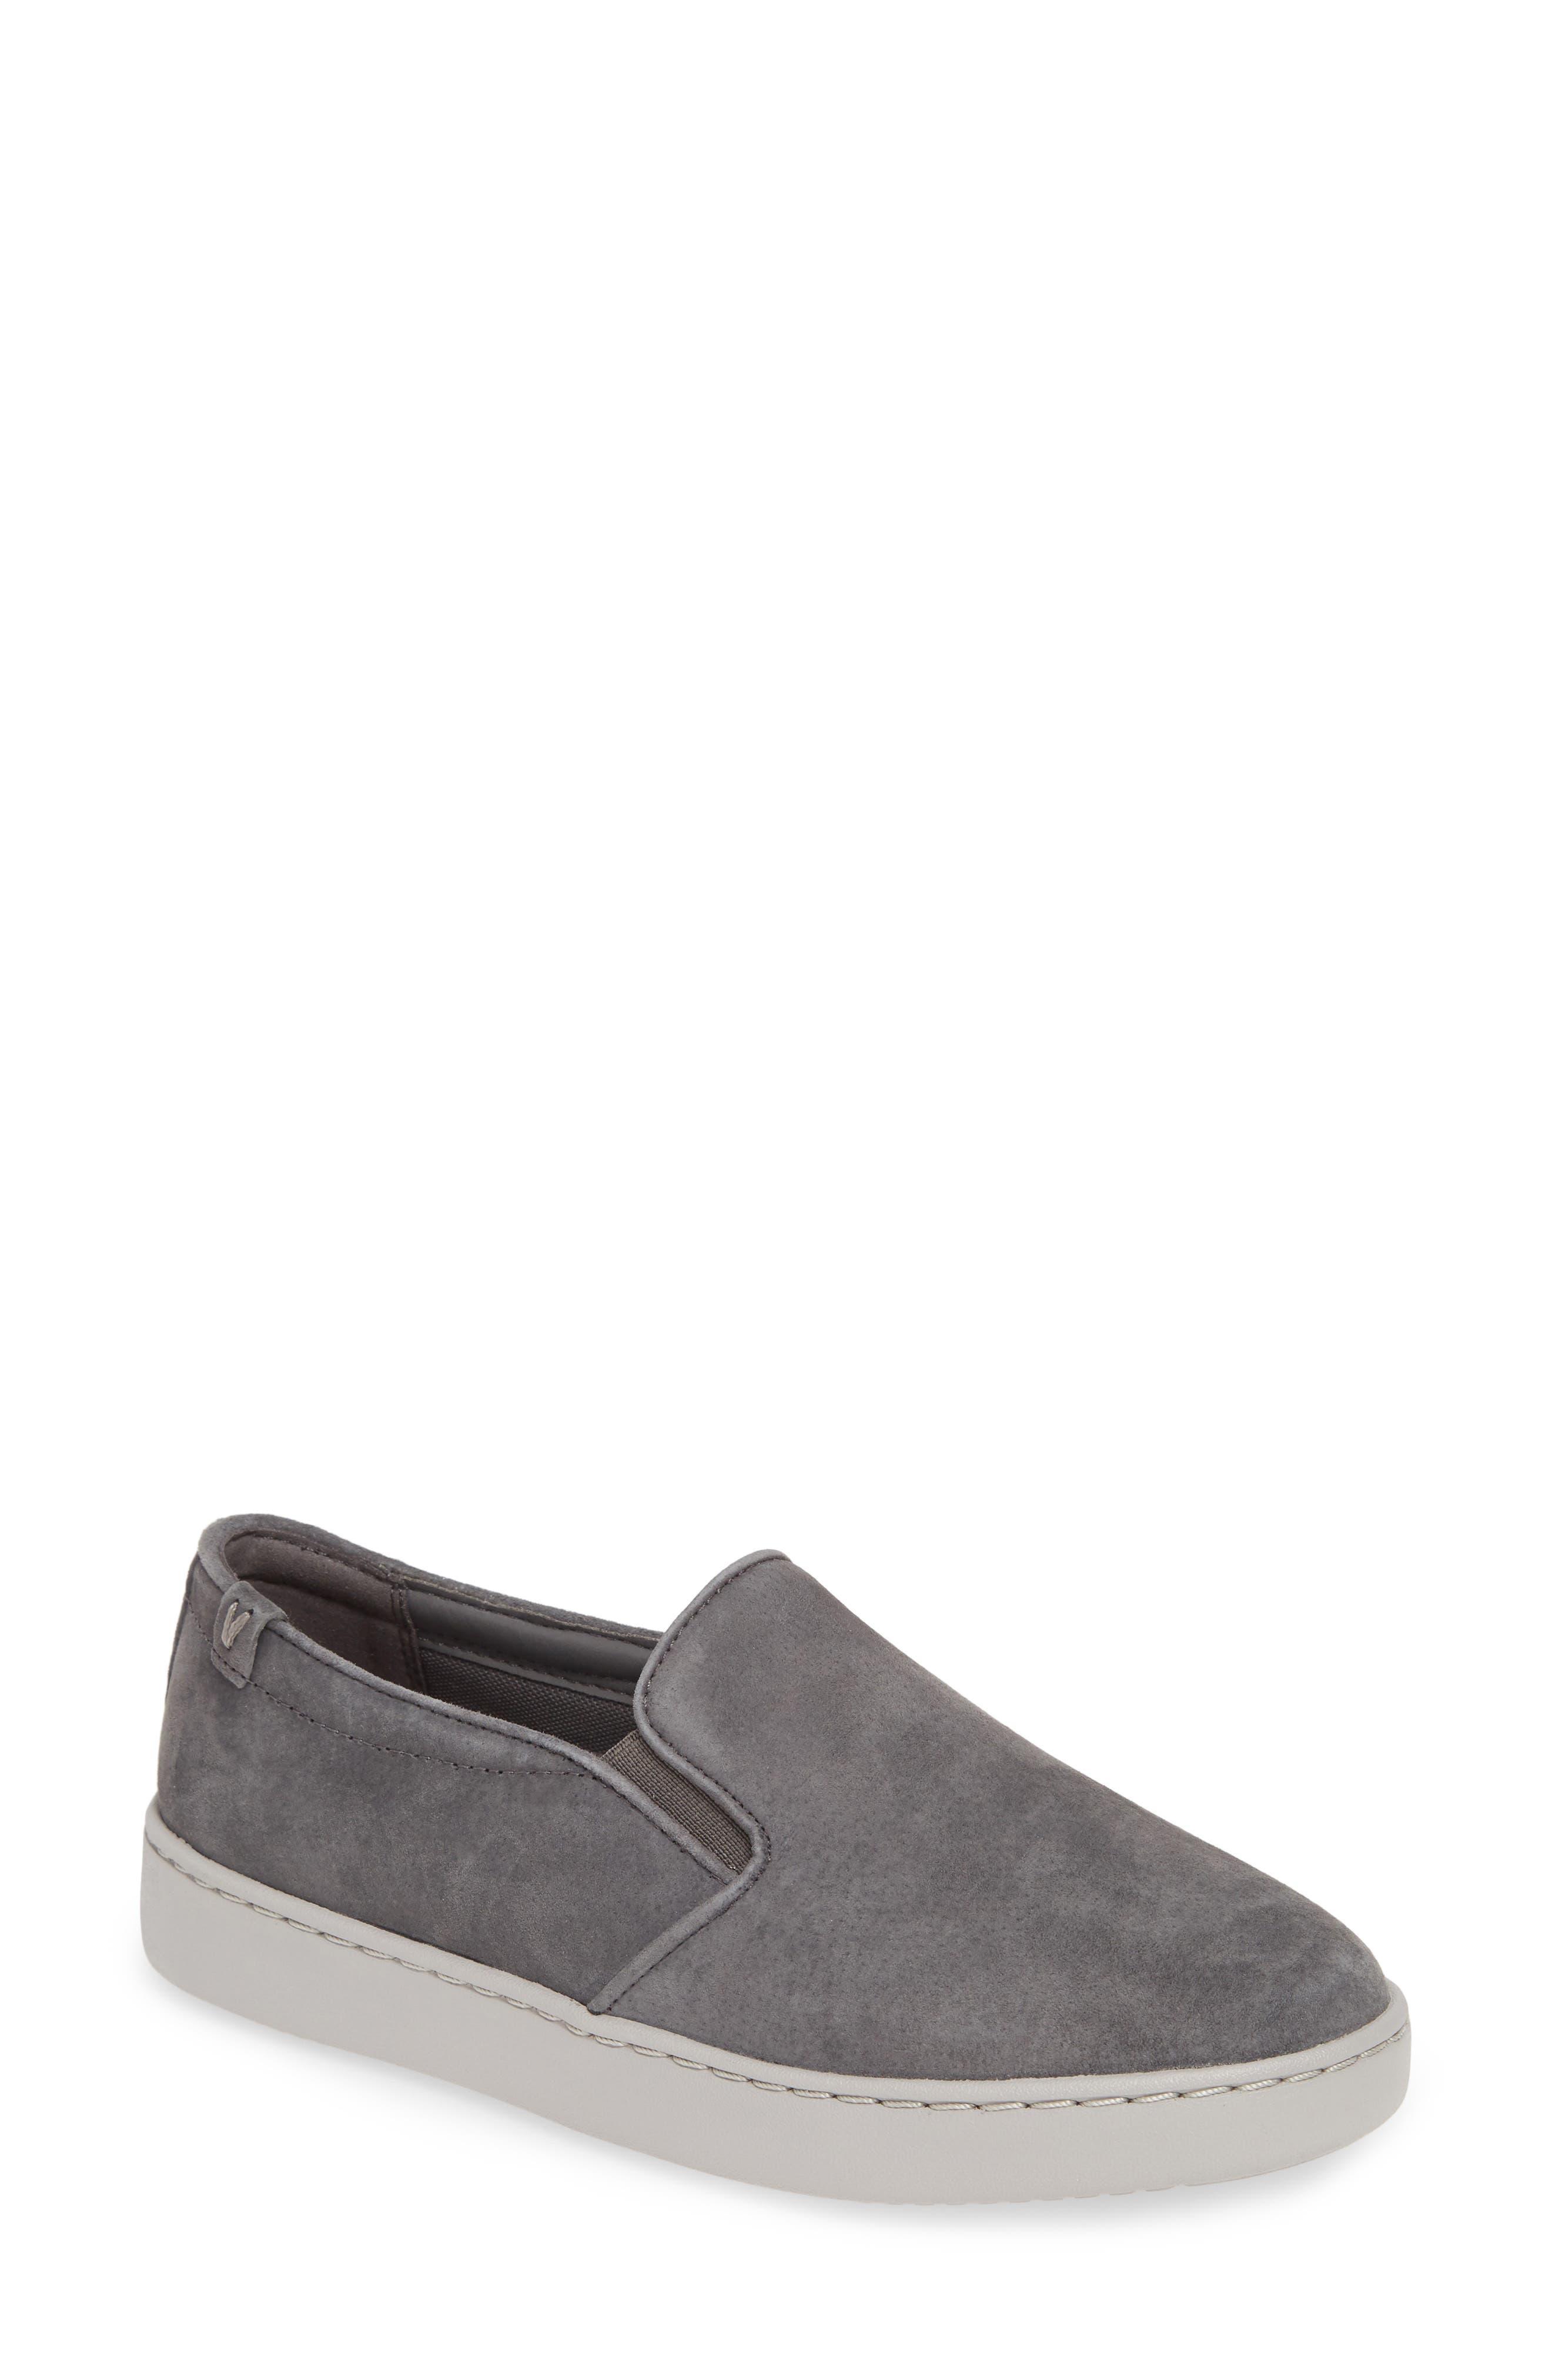 Vionic Avery Sneaker, Grey